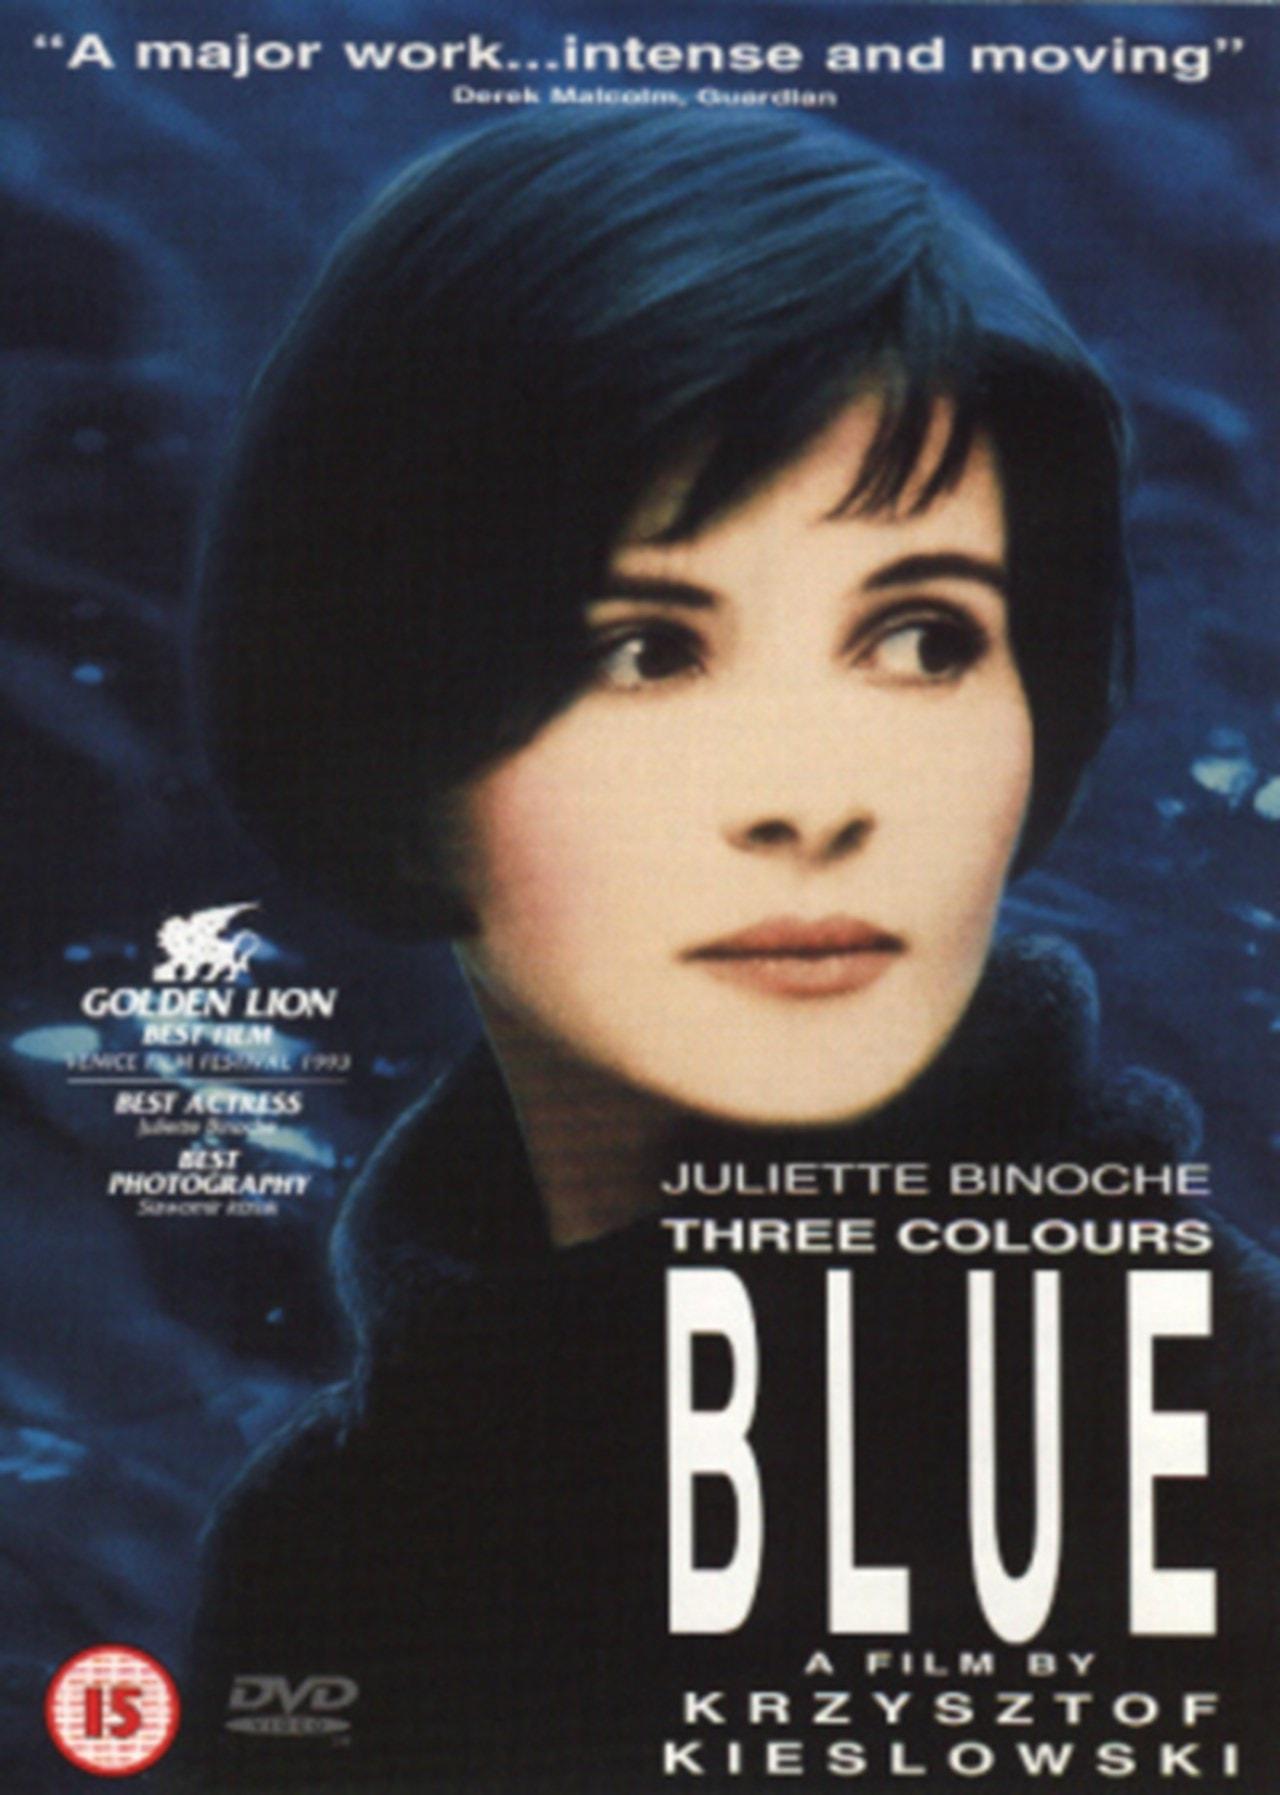 Three Colours: Blue - 1